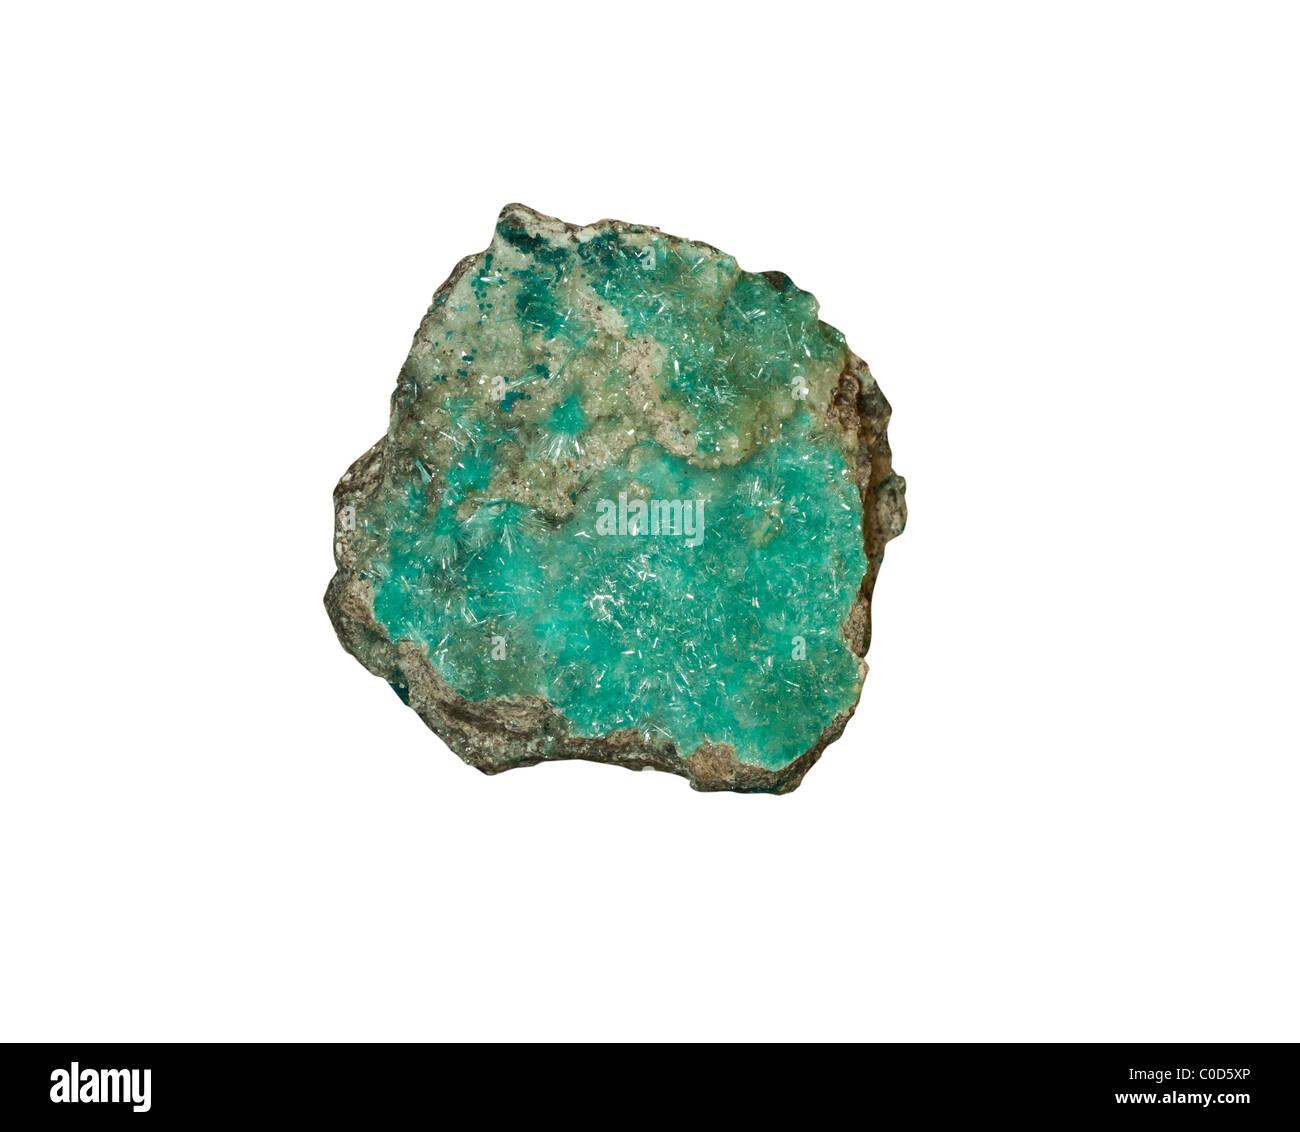 Aurichalcite and Rosasite Minerals Durango Mexico - Stock Image